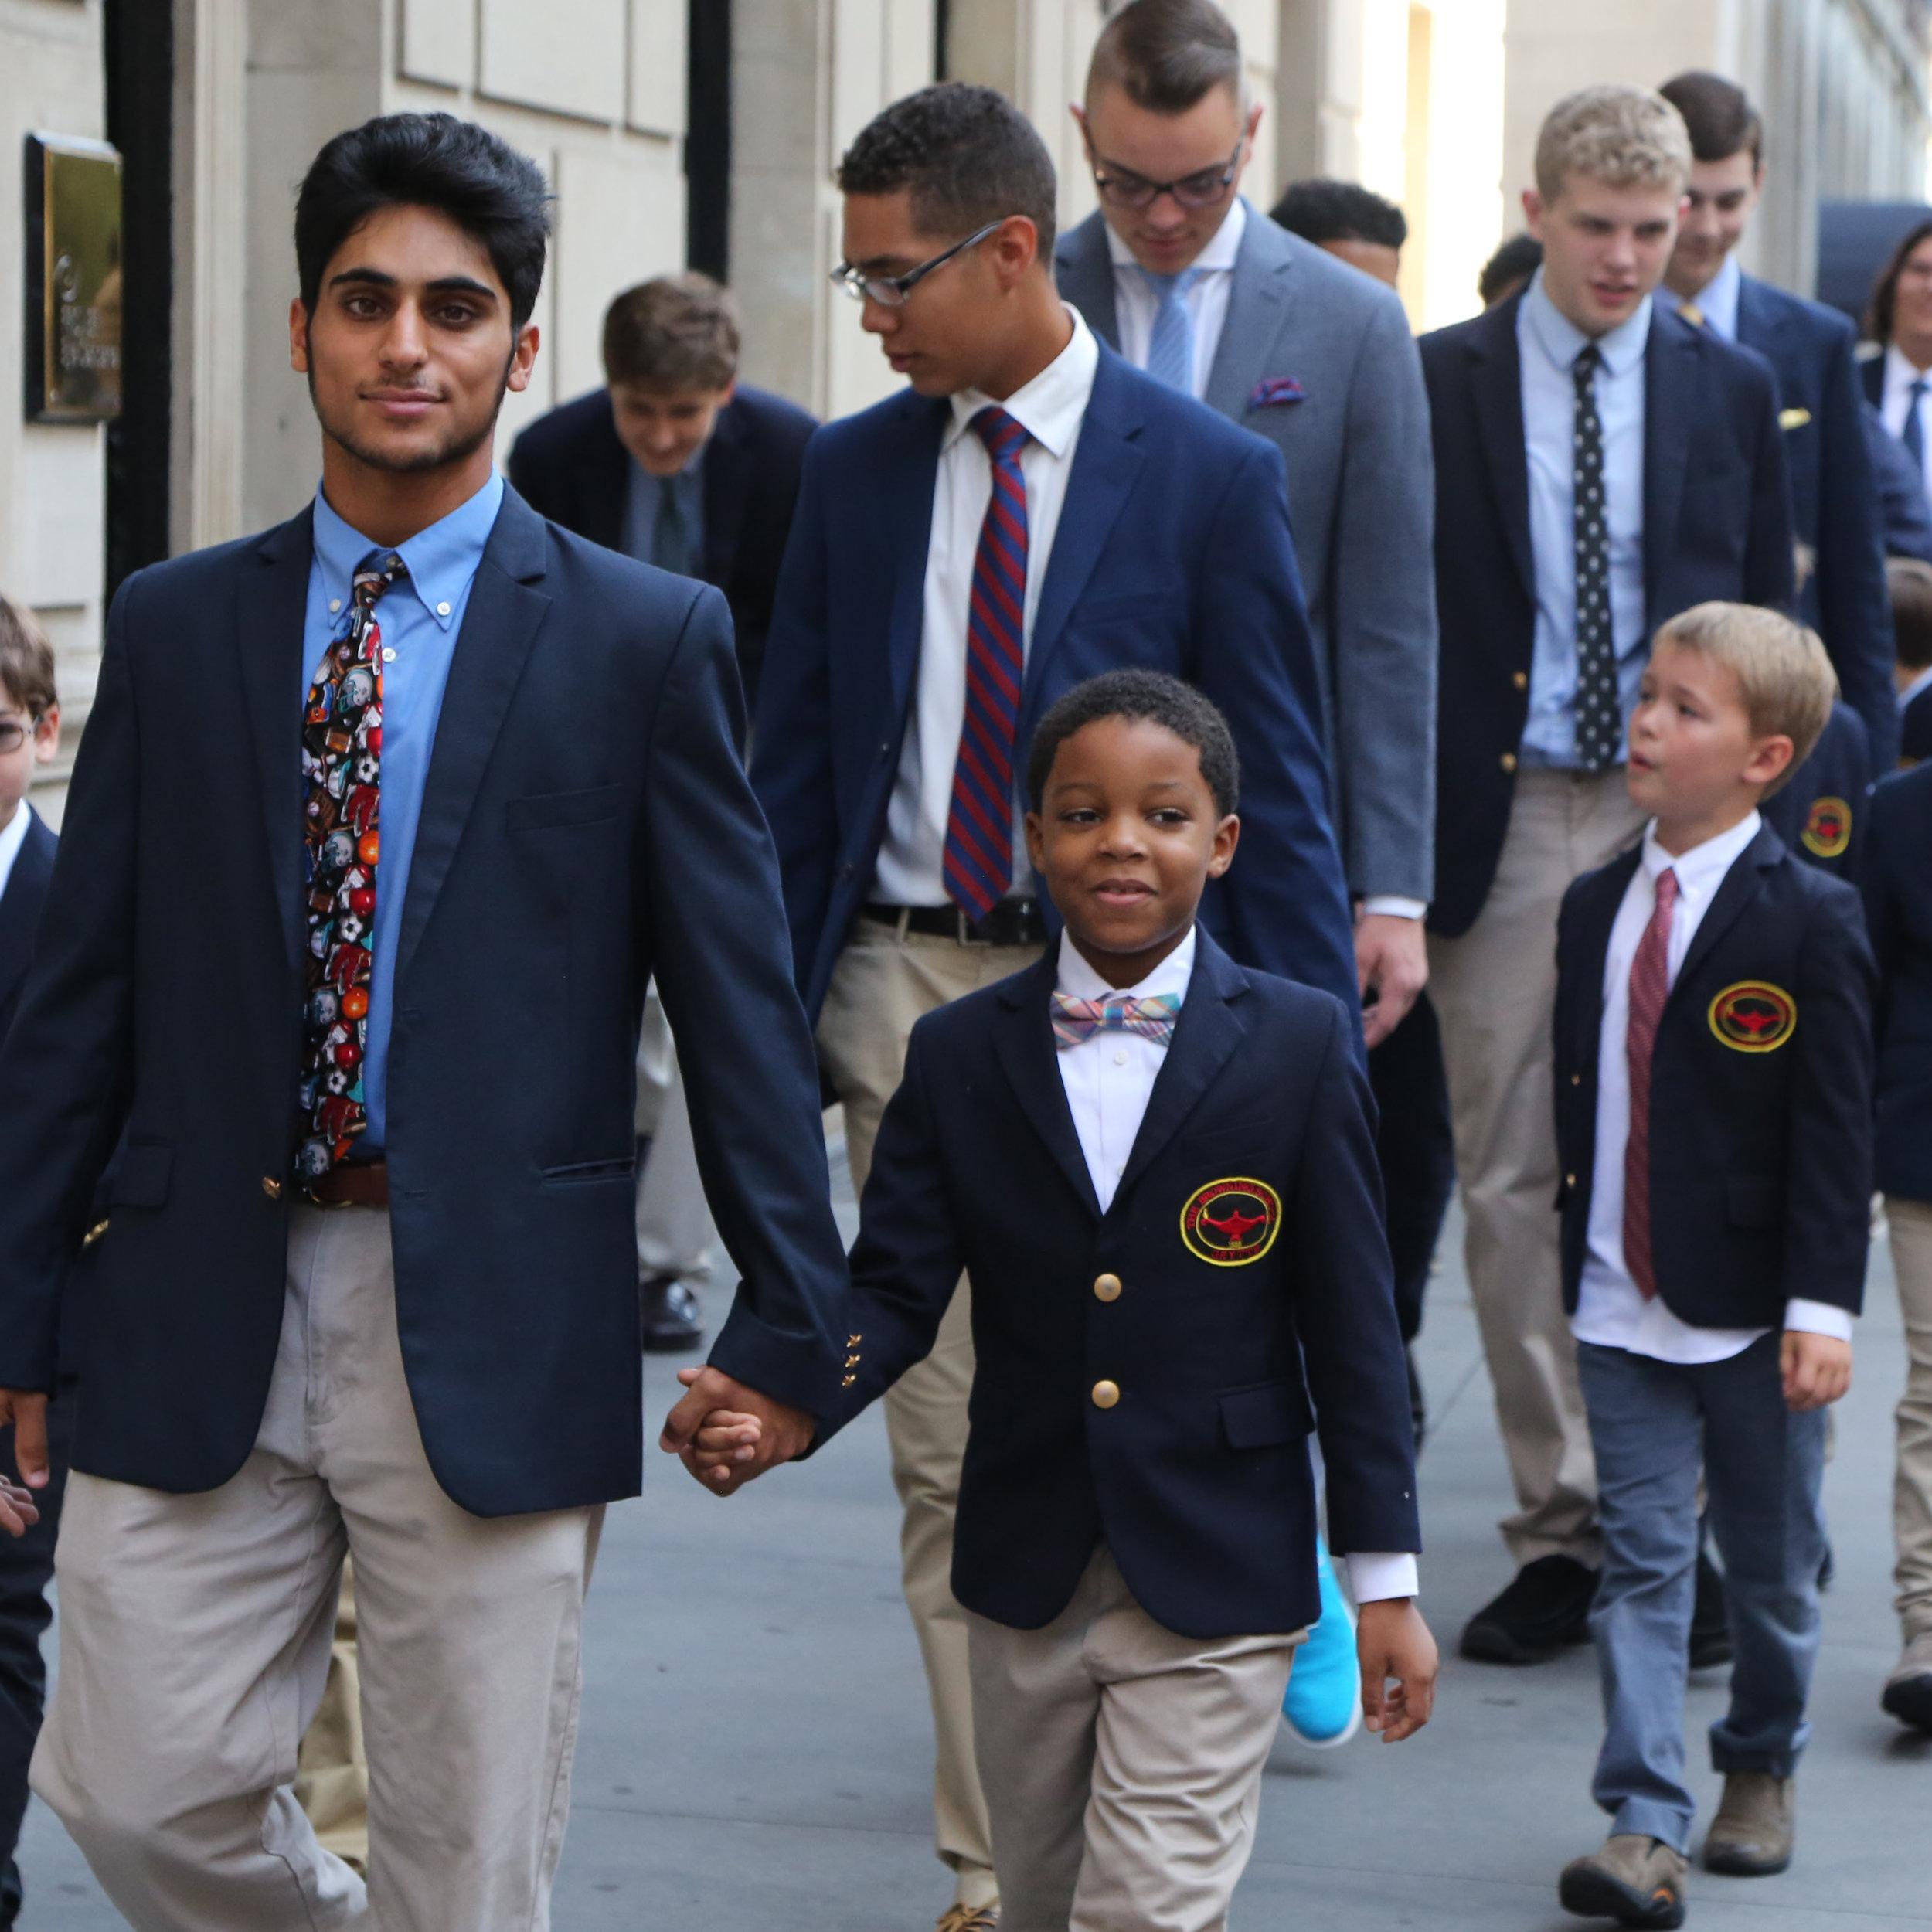 Boys' Education - Learn More